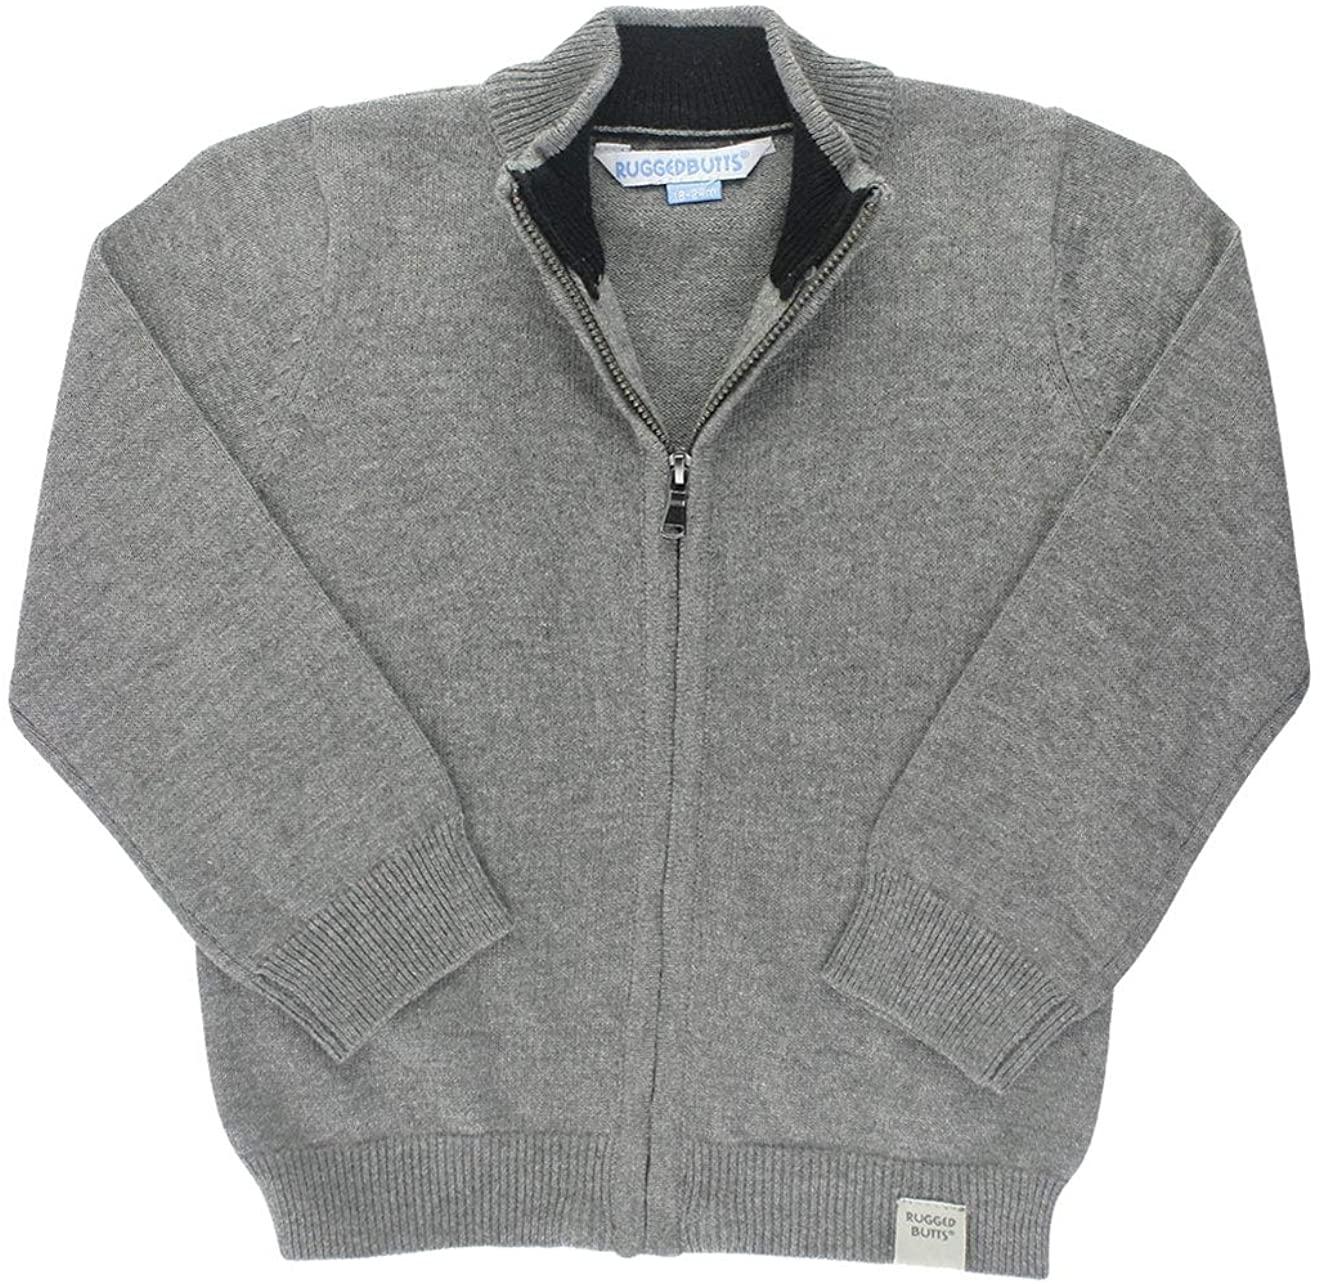 RuggedButts Baby/Toddler Boys Full-Zip Sweater